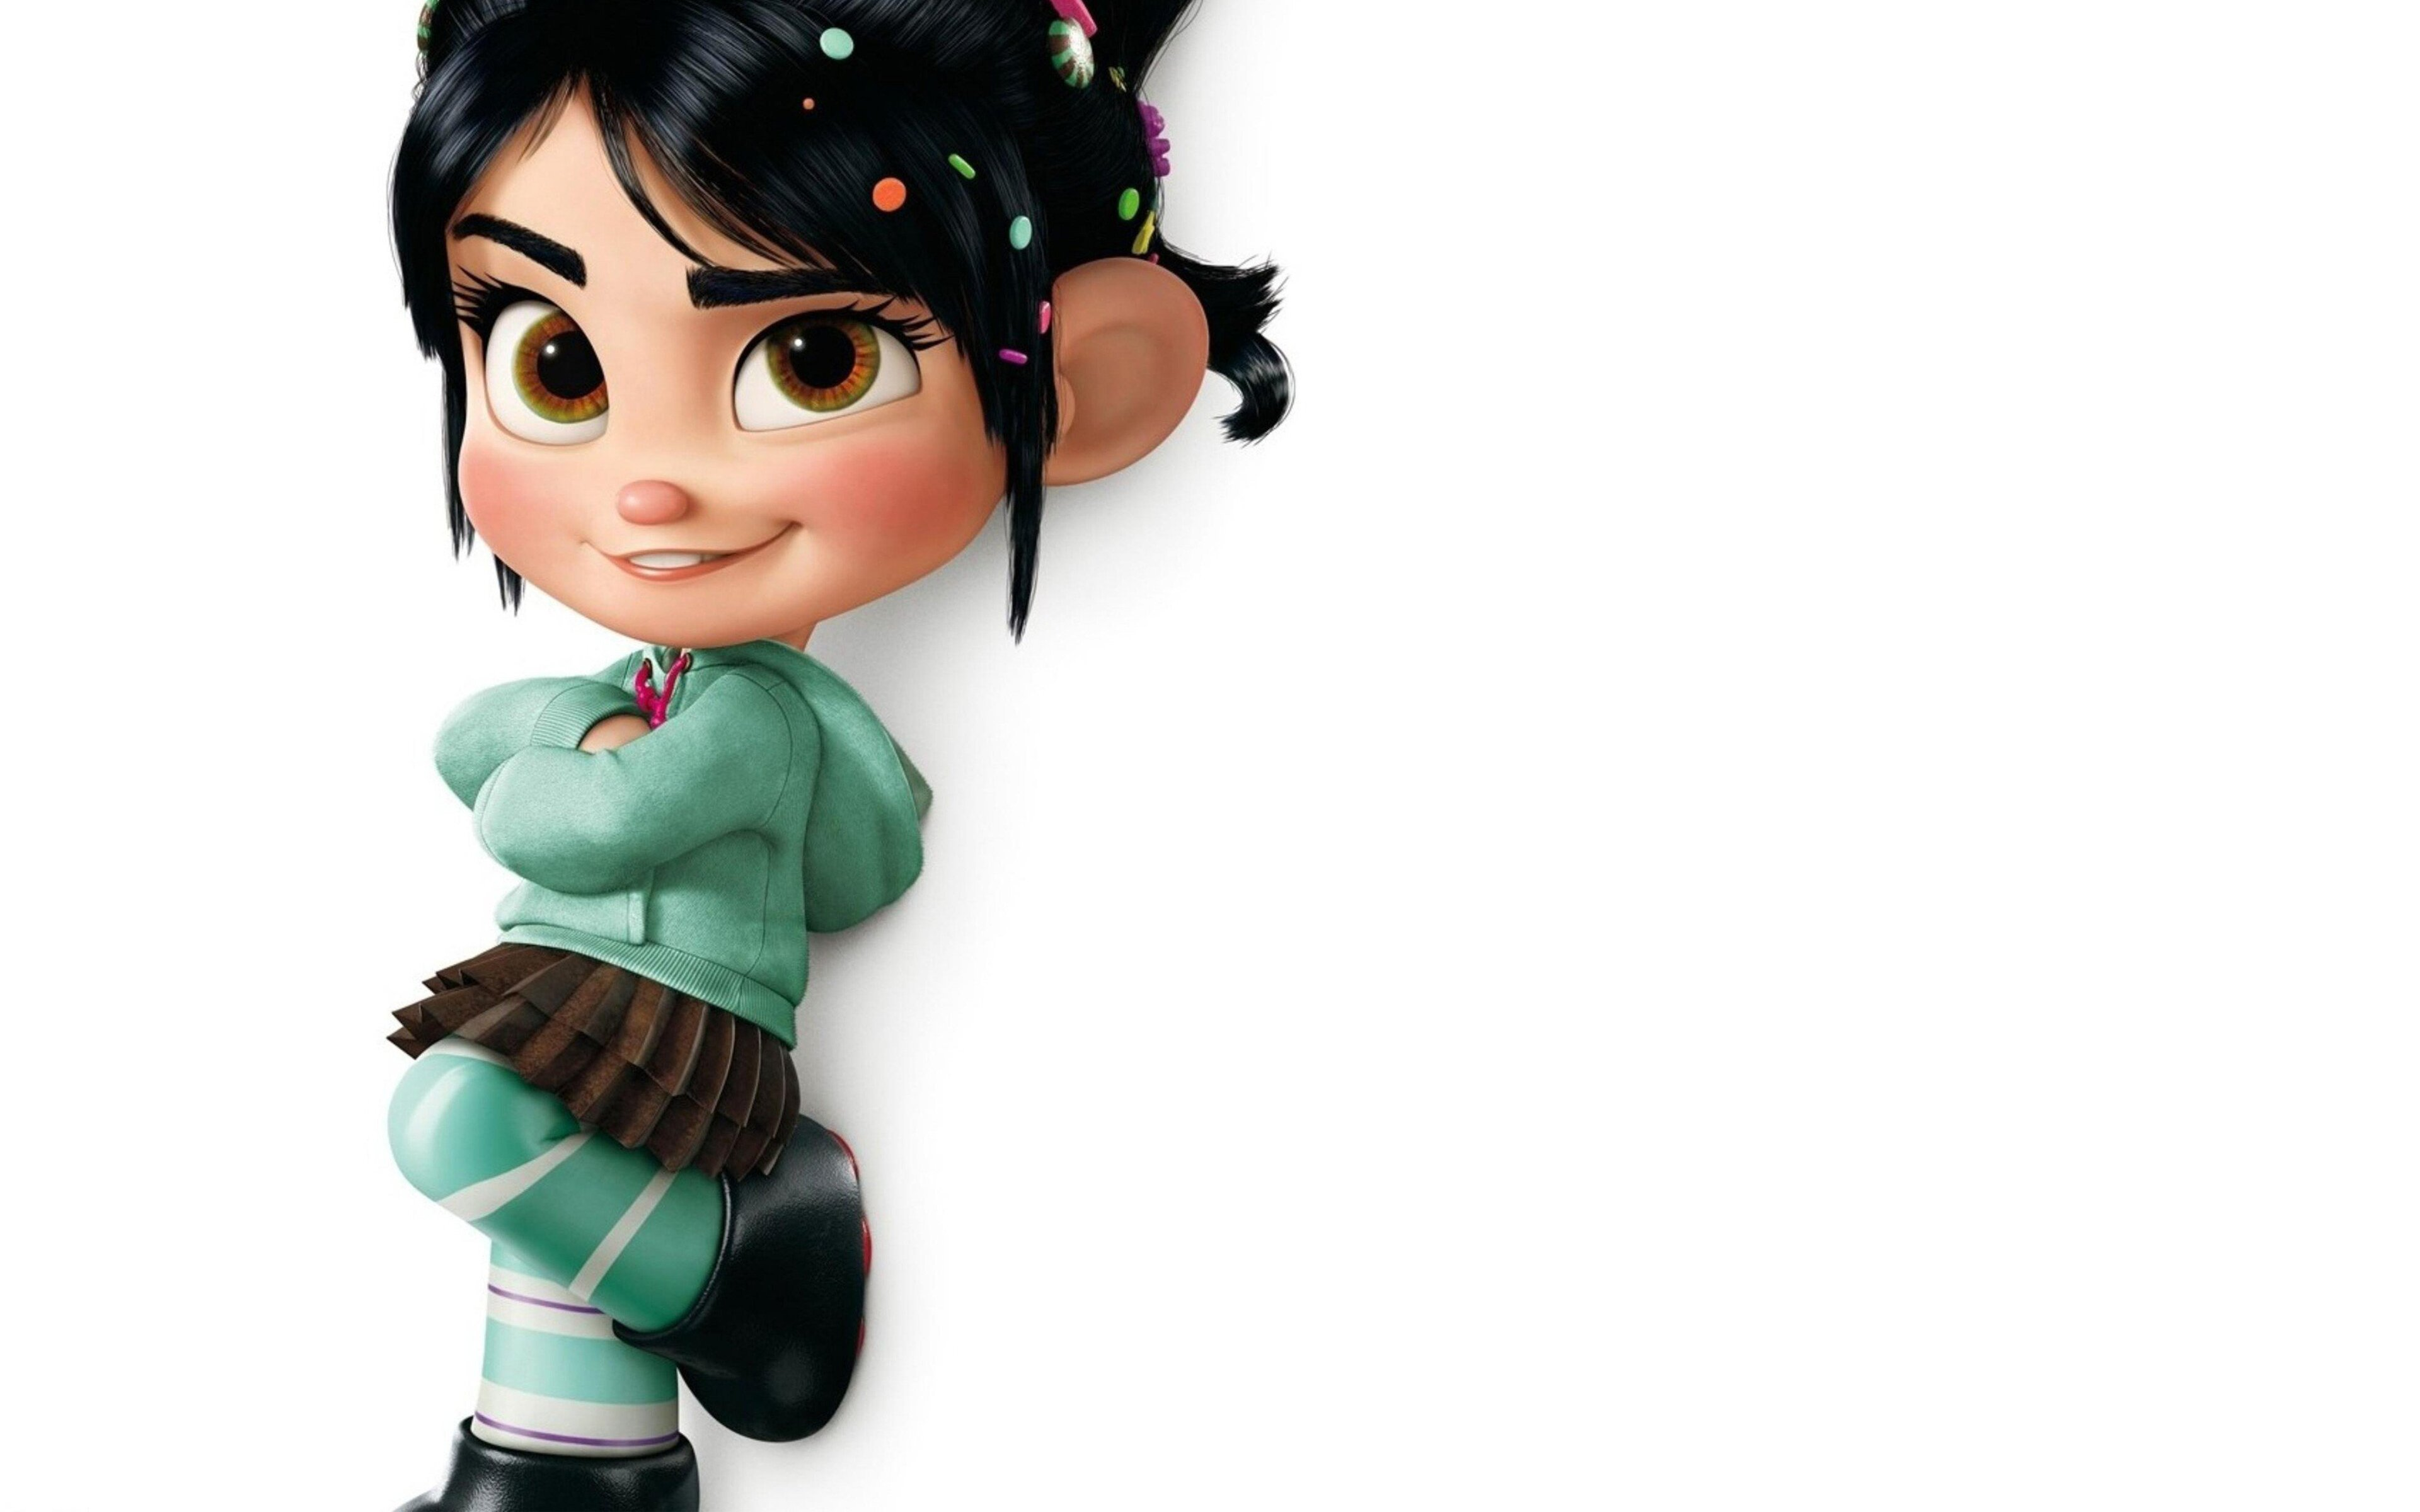 Wreck It Ralph Animation Movie 4k Hd Desktop Wallpaper For: 3840x2400 Vanellope Wreck It Ralph 4k HD 4k Wallpapers